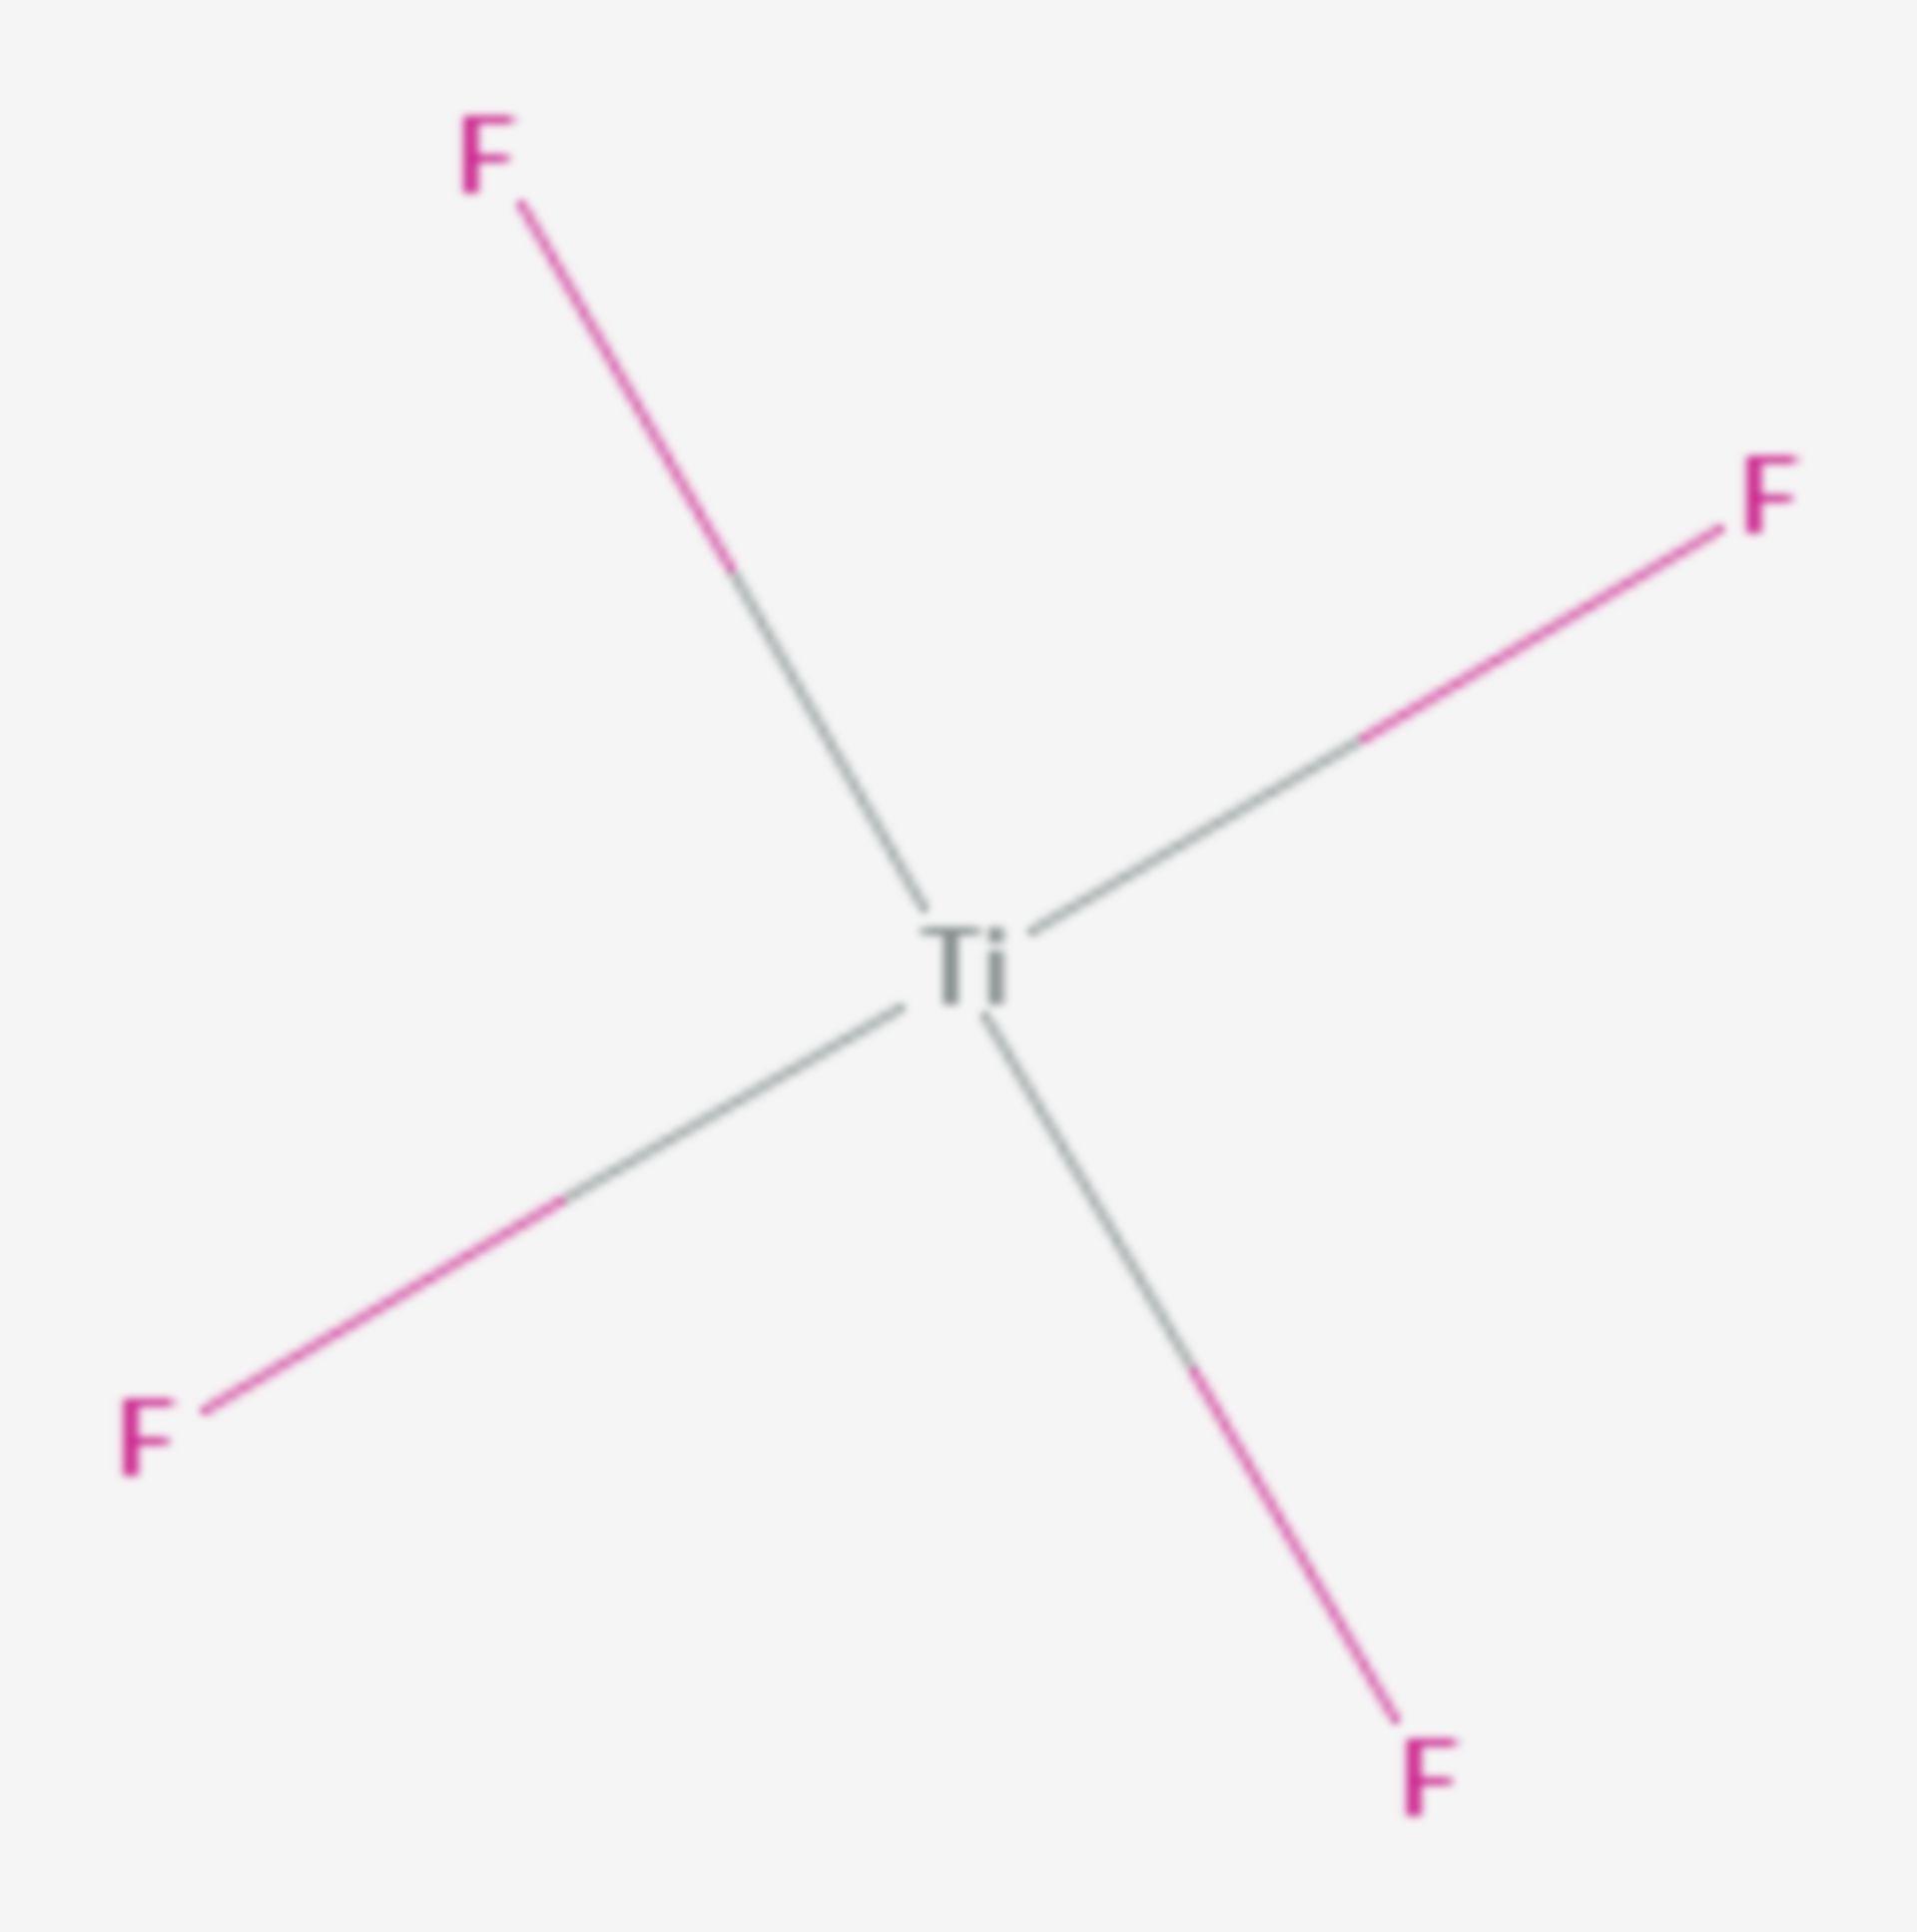 Titan(IV)-fluorid (Strukturformel)